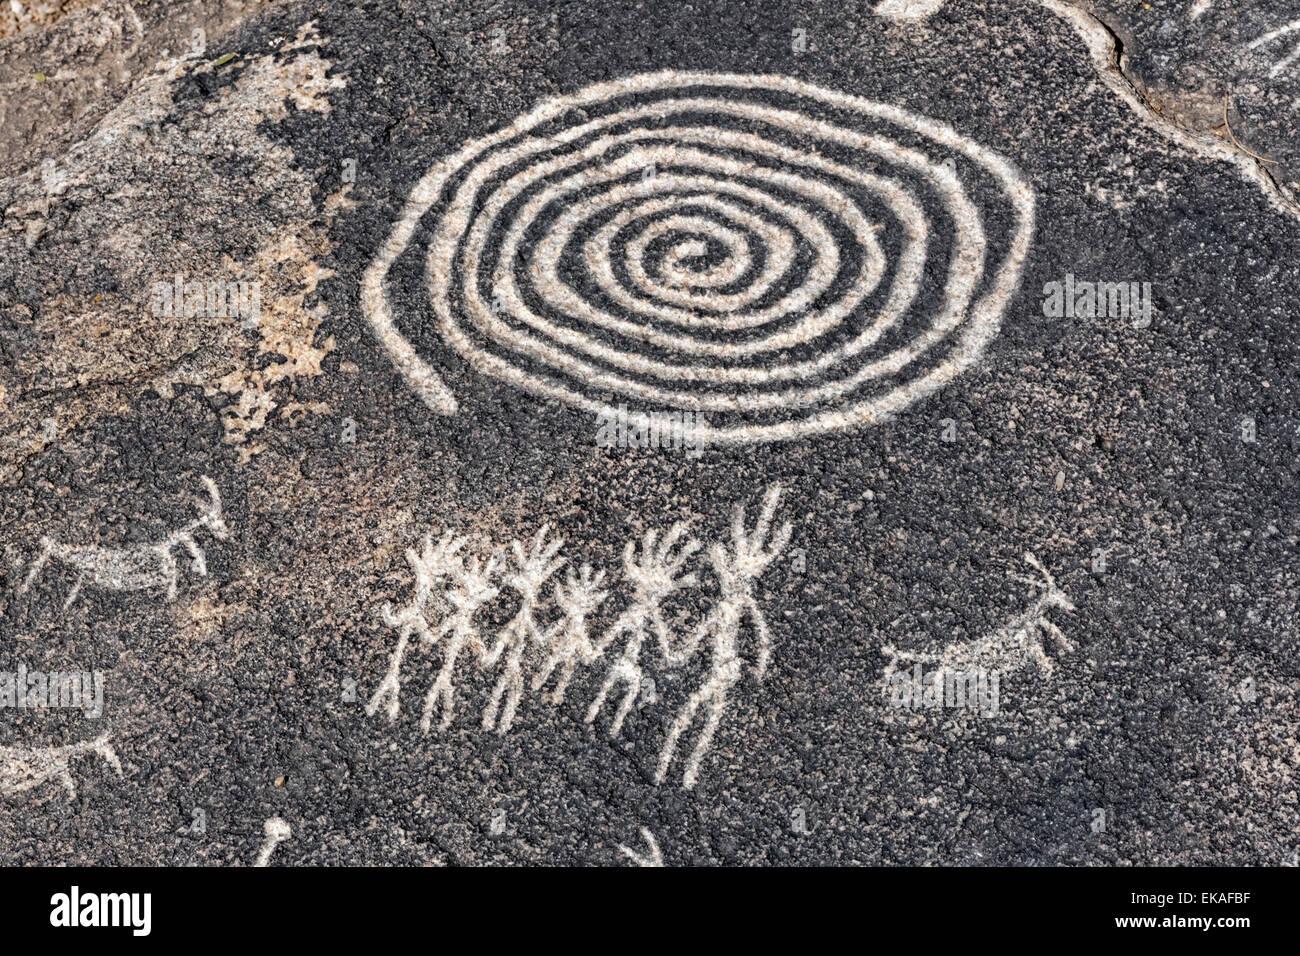 http://c8.alamy.com/comp/EKAFBF/petroglyphs-created-by-the-hohokam-indians-who-occupied-the-valleys-EKAFBF.jpg